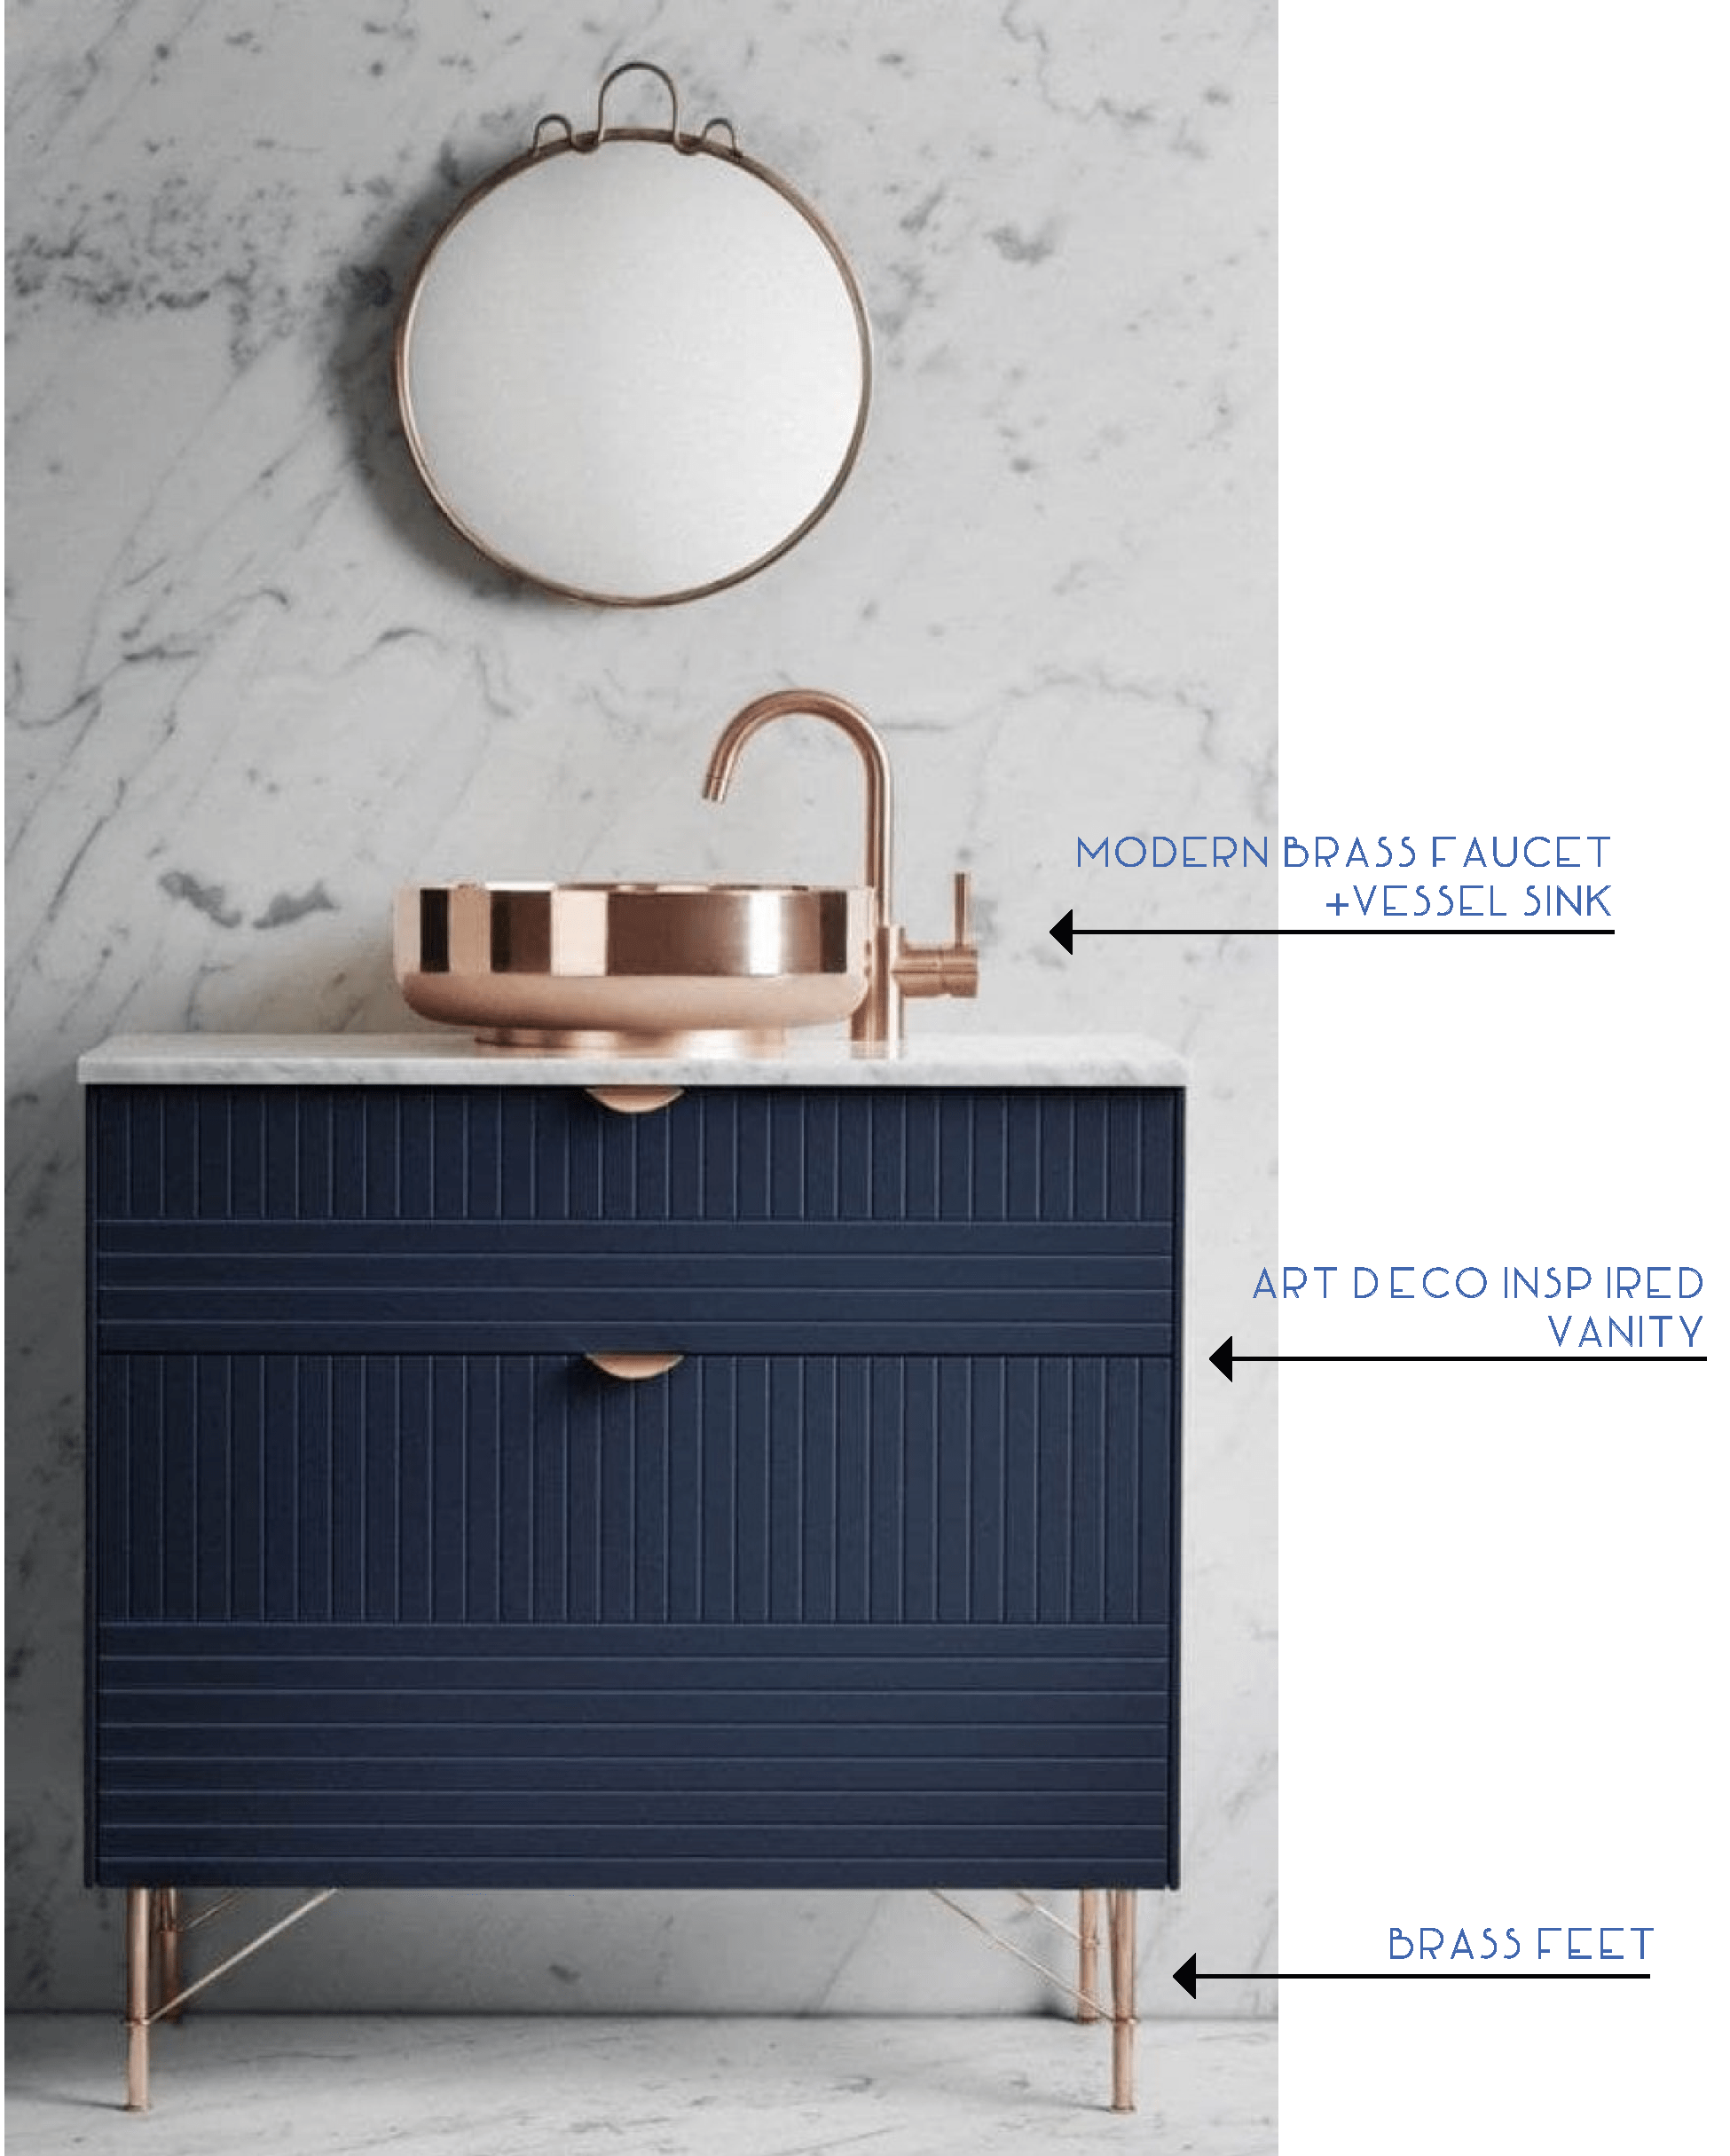 Discovering Your Bathroom Vanity Spirit Animal Art Deco Bathroom Vanity Bathroom Remodel Designs Small Bathroom Remodel Cost